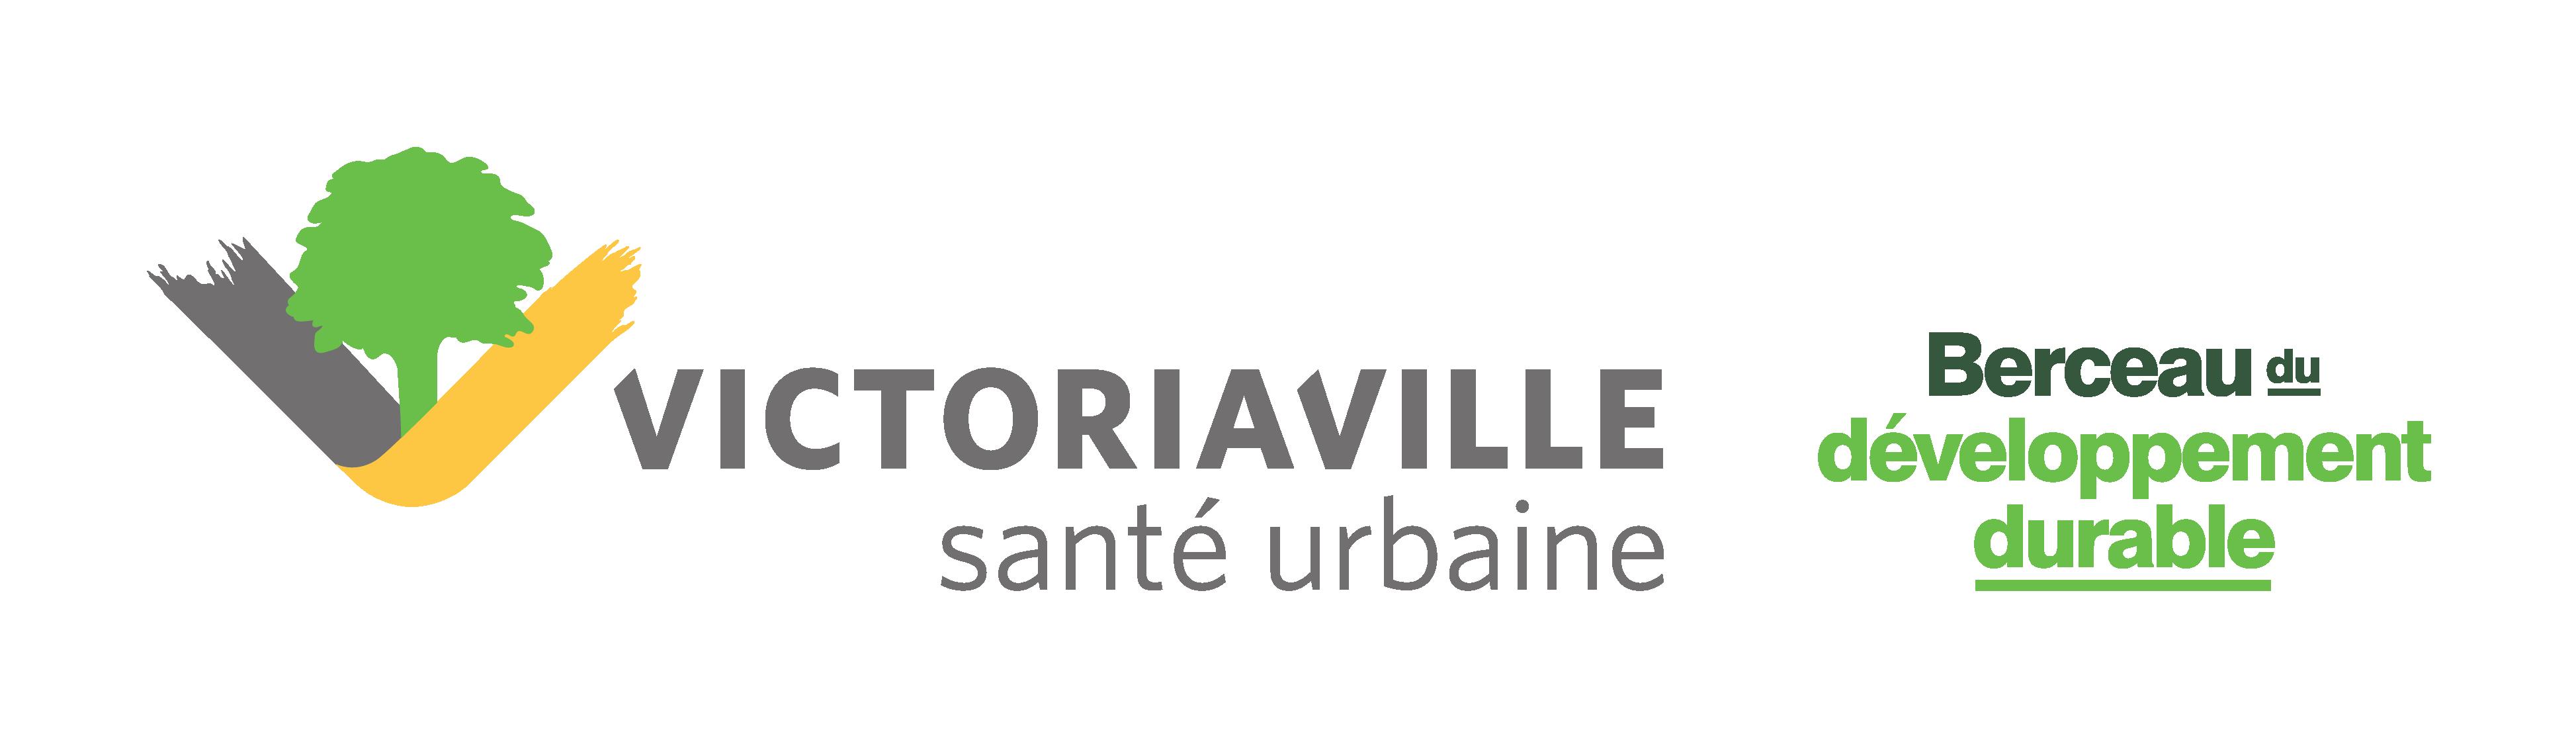 logotype de victoriaville et slogan